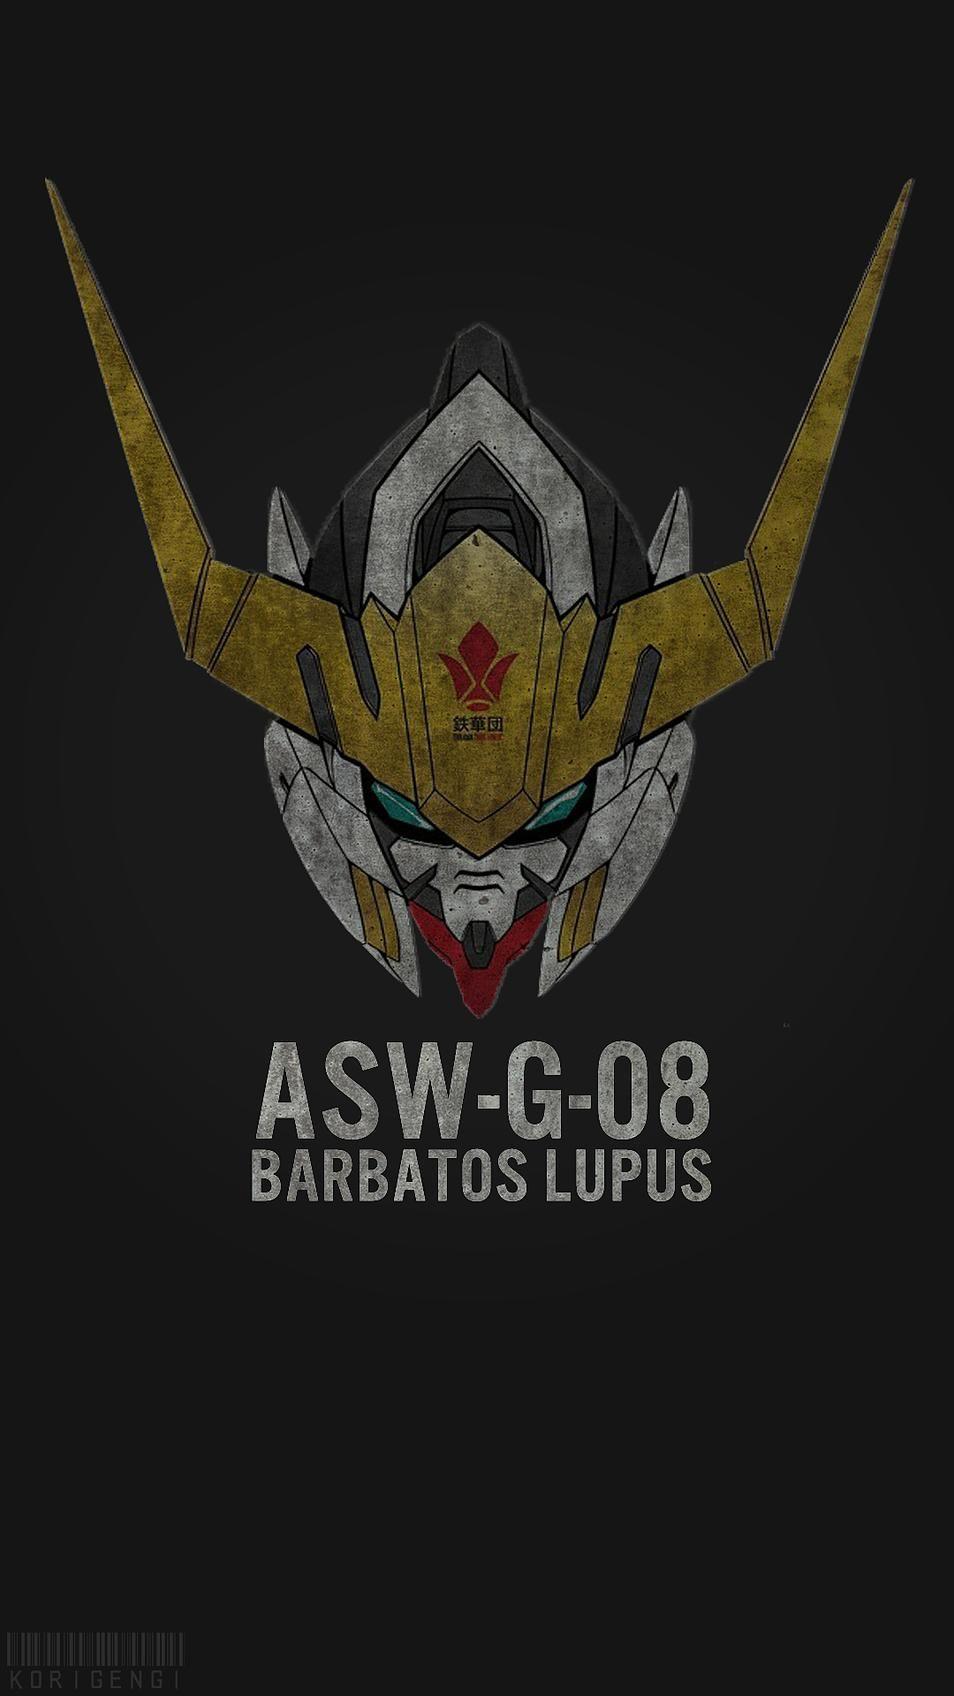 Barbatos lupus head korigengi wallpaper anime korigengi barbatos lupus head korigengi wallpaper anime voltagebd Images